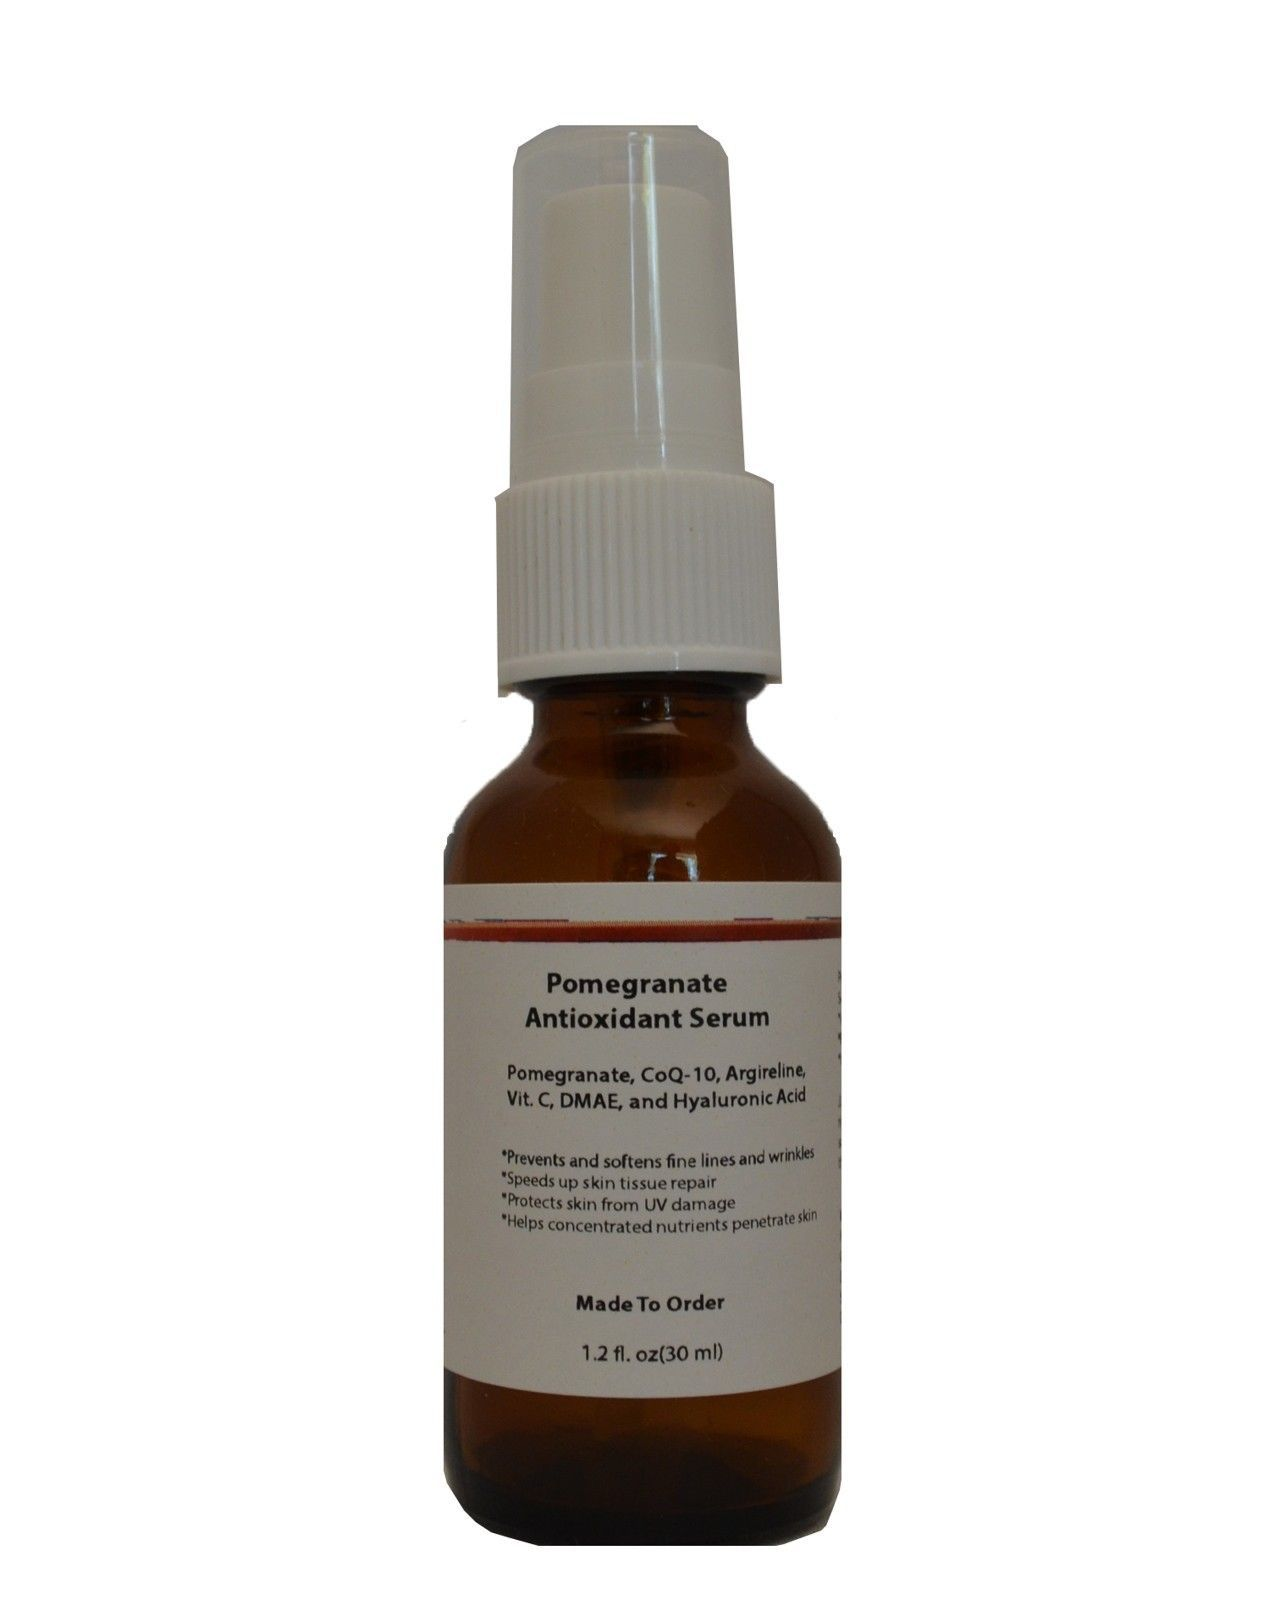 Pomegranate Anti Oxidant Serum with CoQ-10, Argireline, Vitamin C, DMAE, HA - $17.33 - $27.23